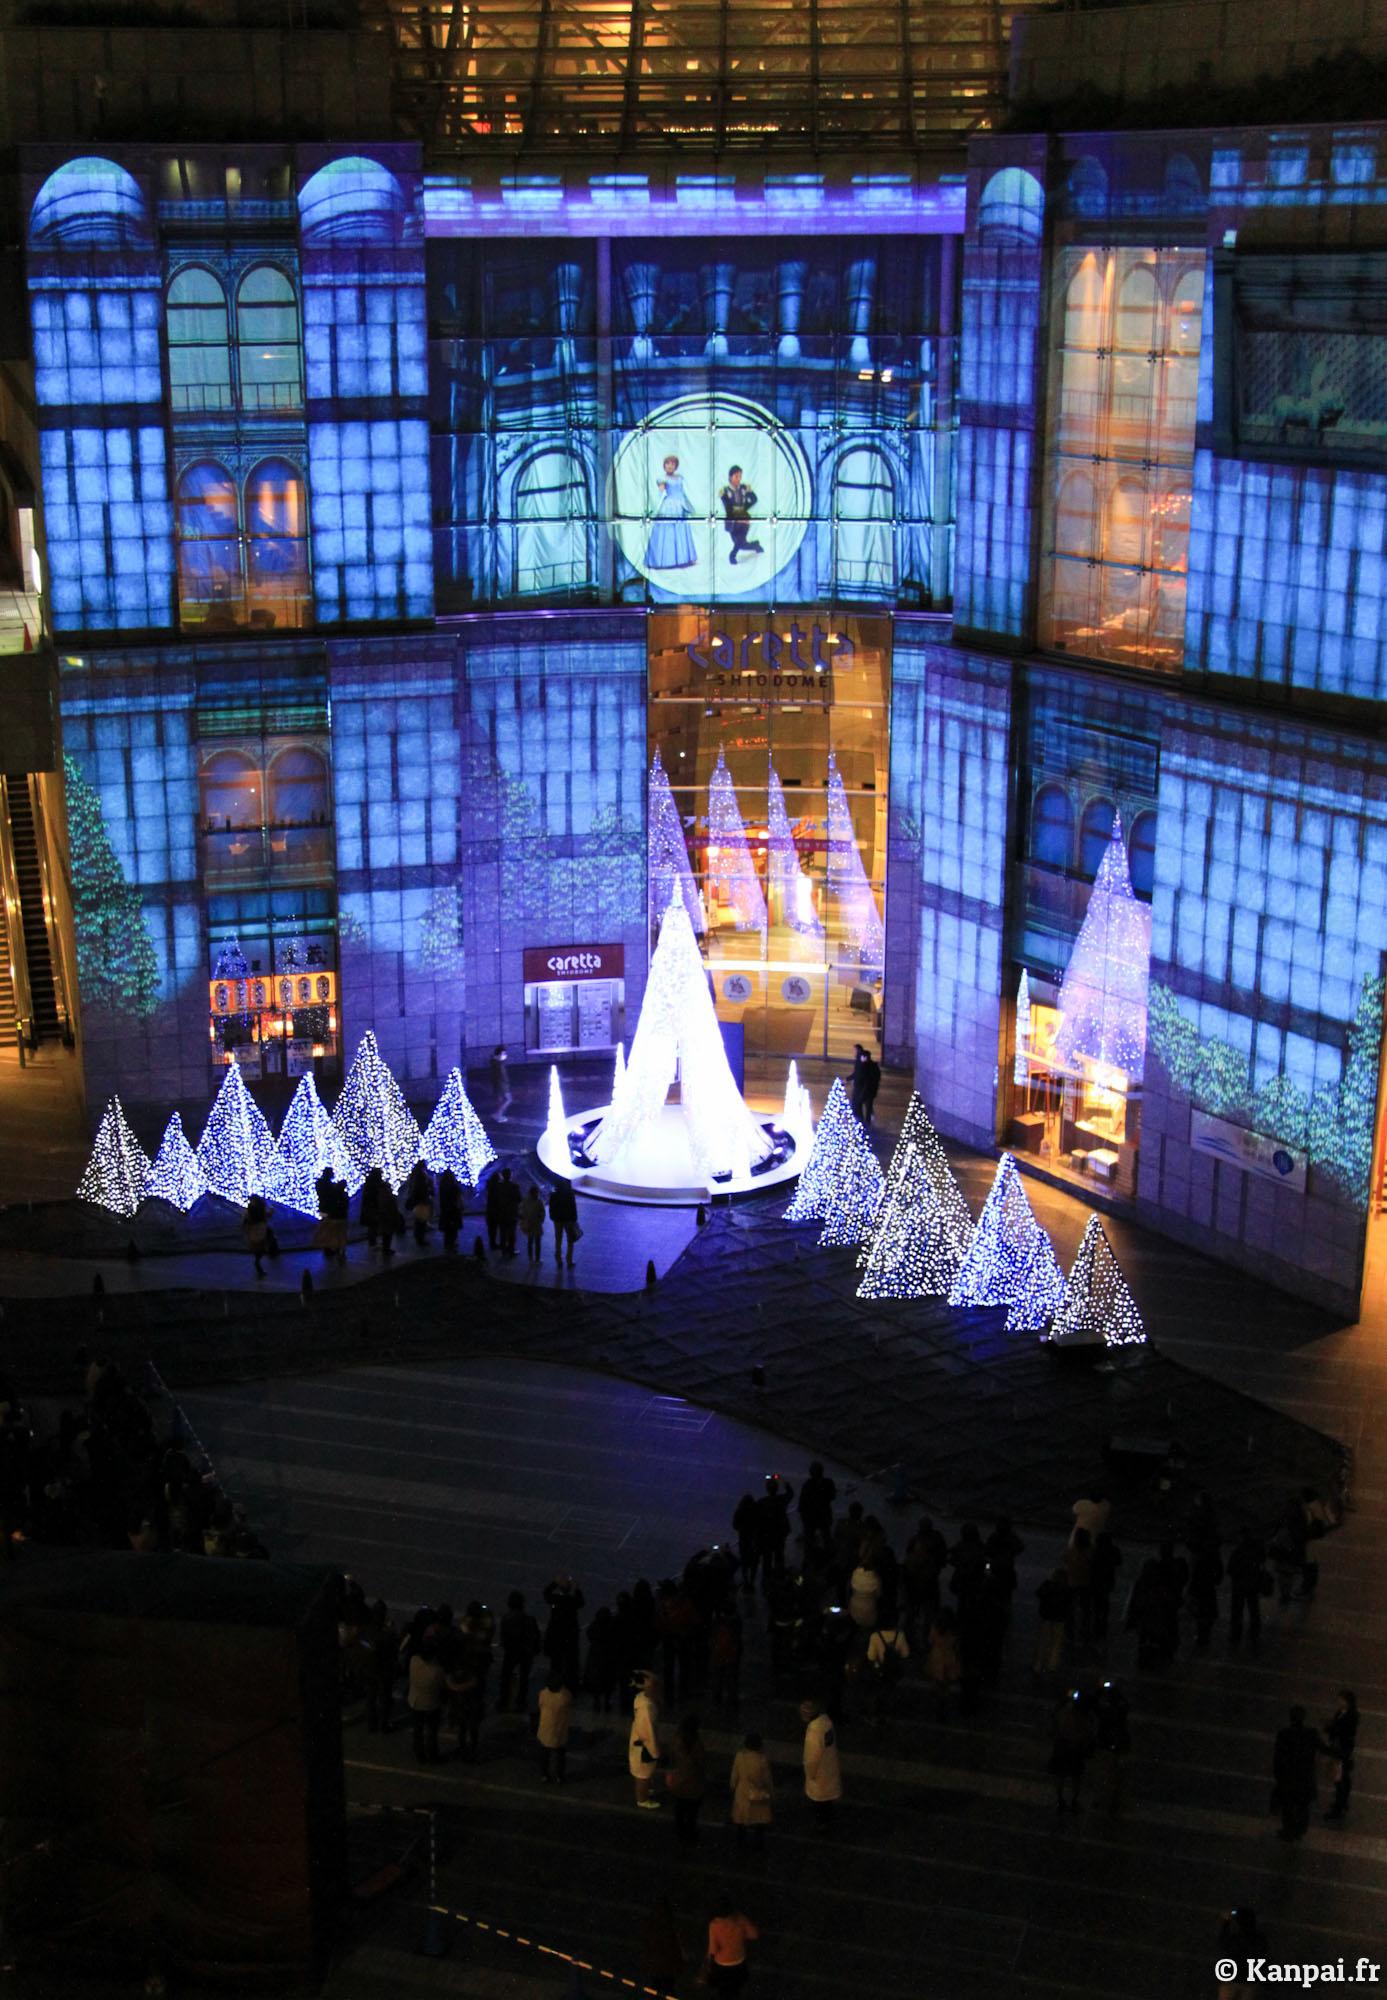 #1262B9 Tokyo à Noël 5327 decorations de noel au japon 1387x2000 px @ aertt.com